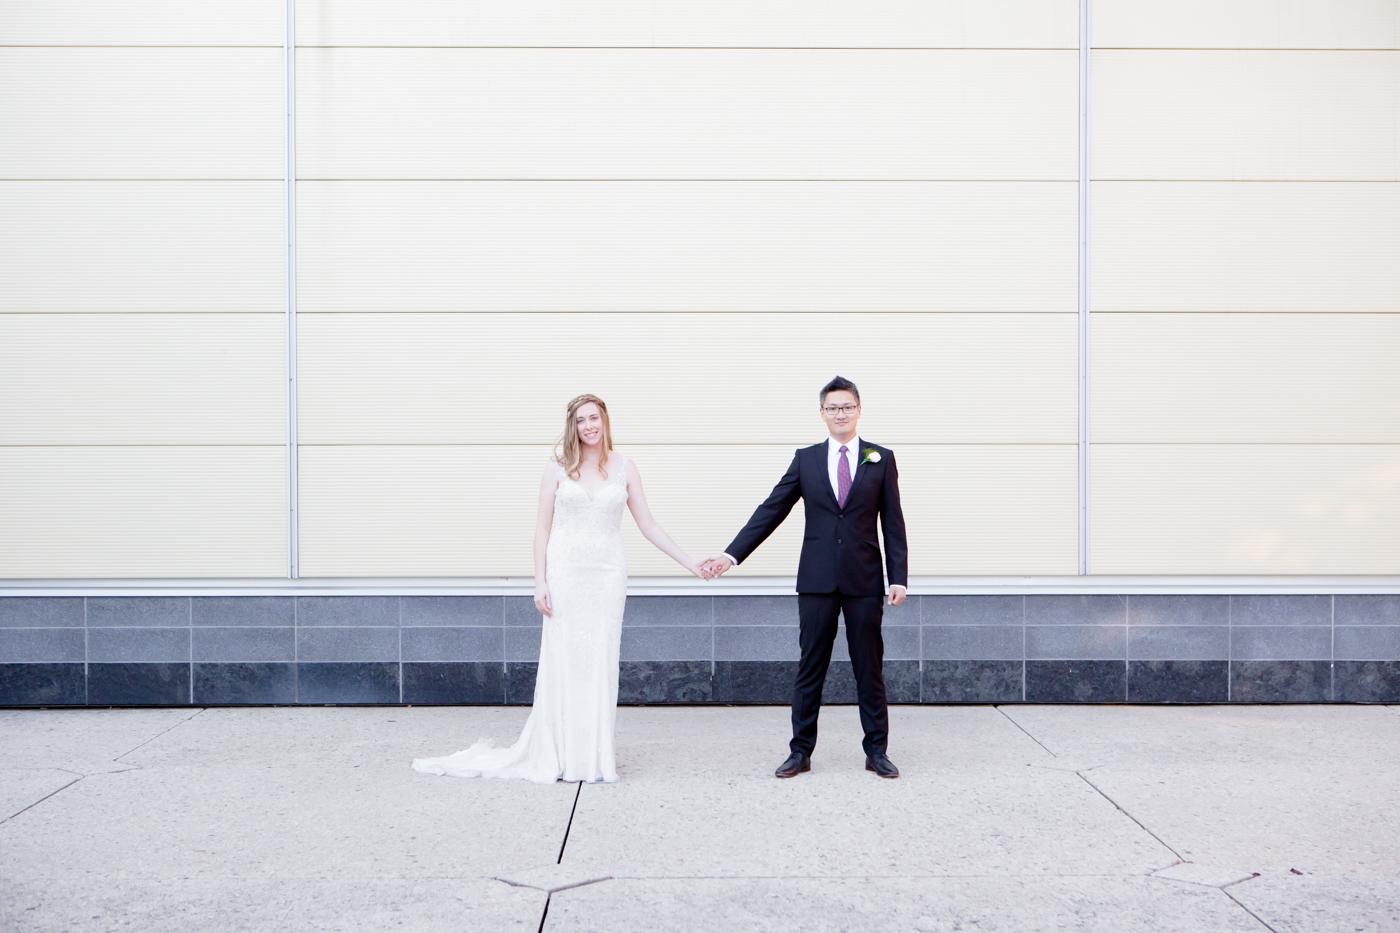 Sam+Amelio_Wedding_Allison Clark Photography-45